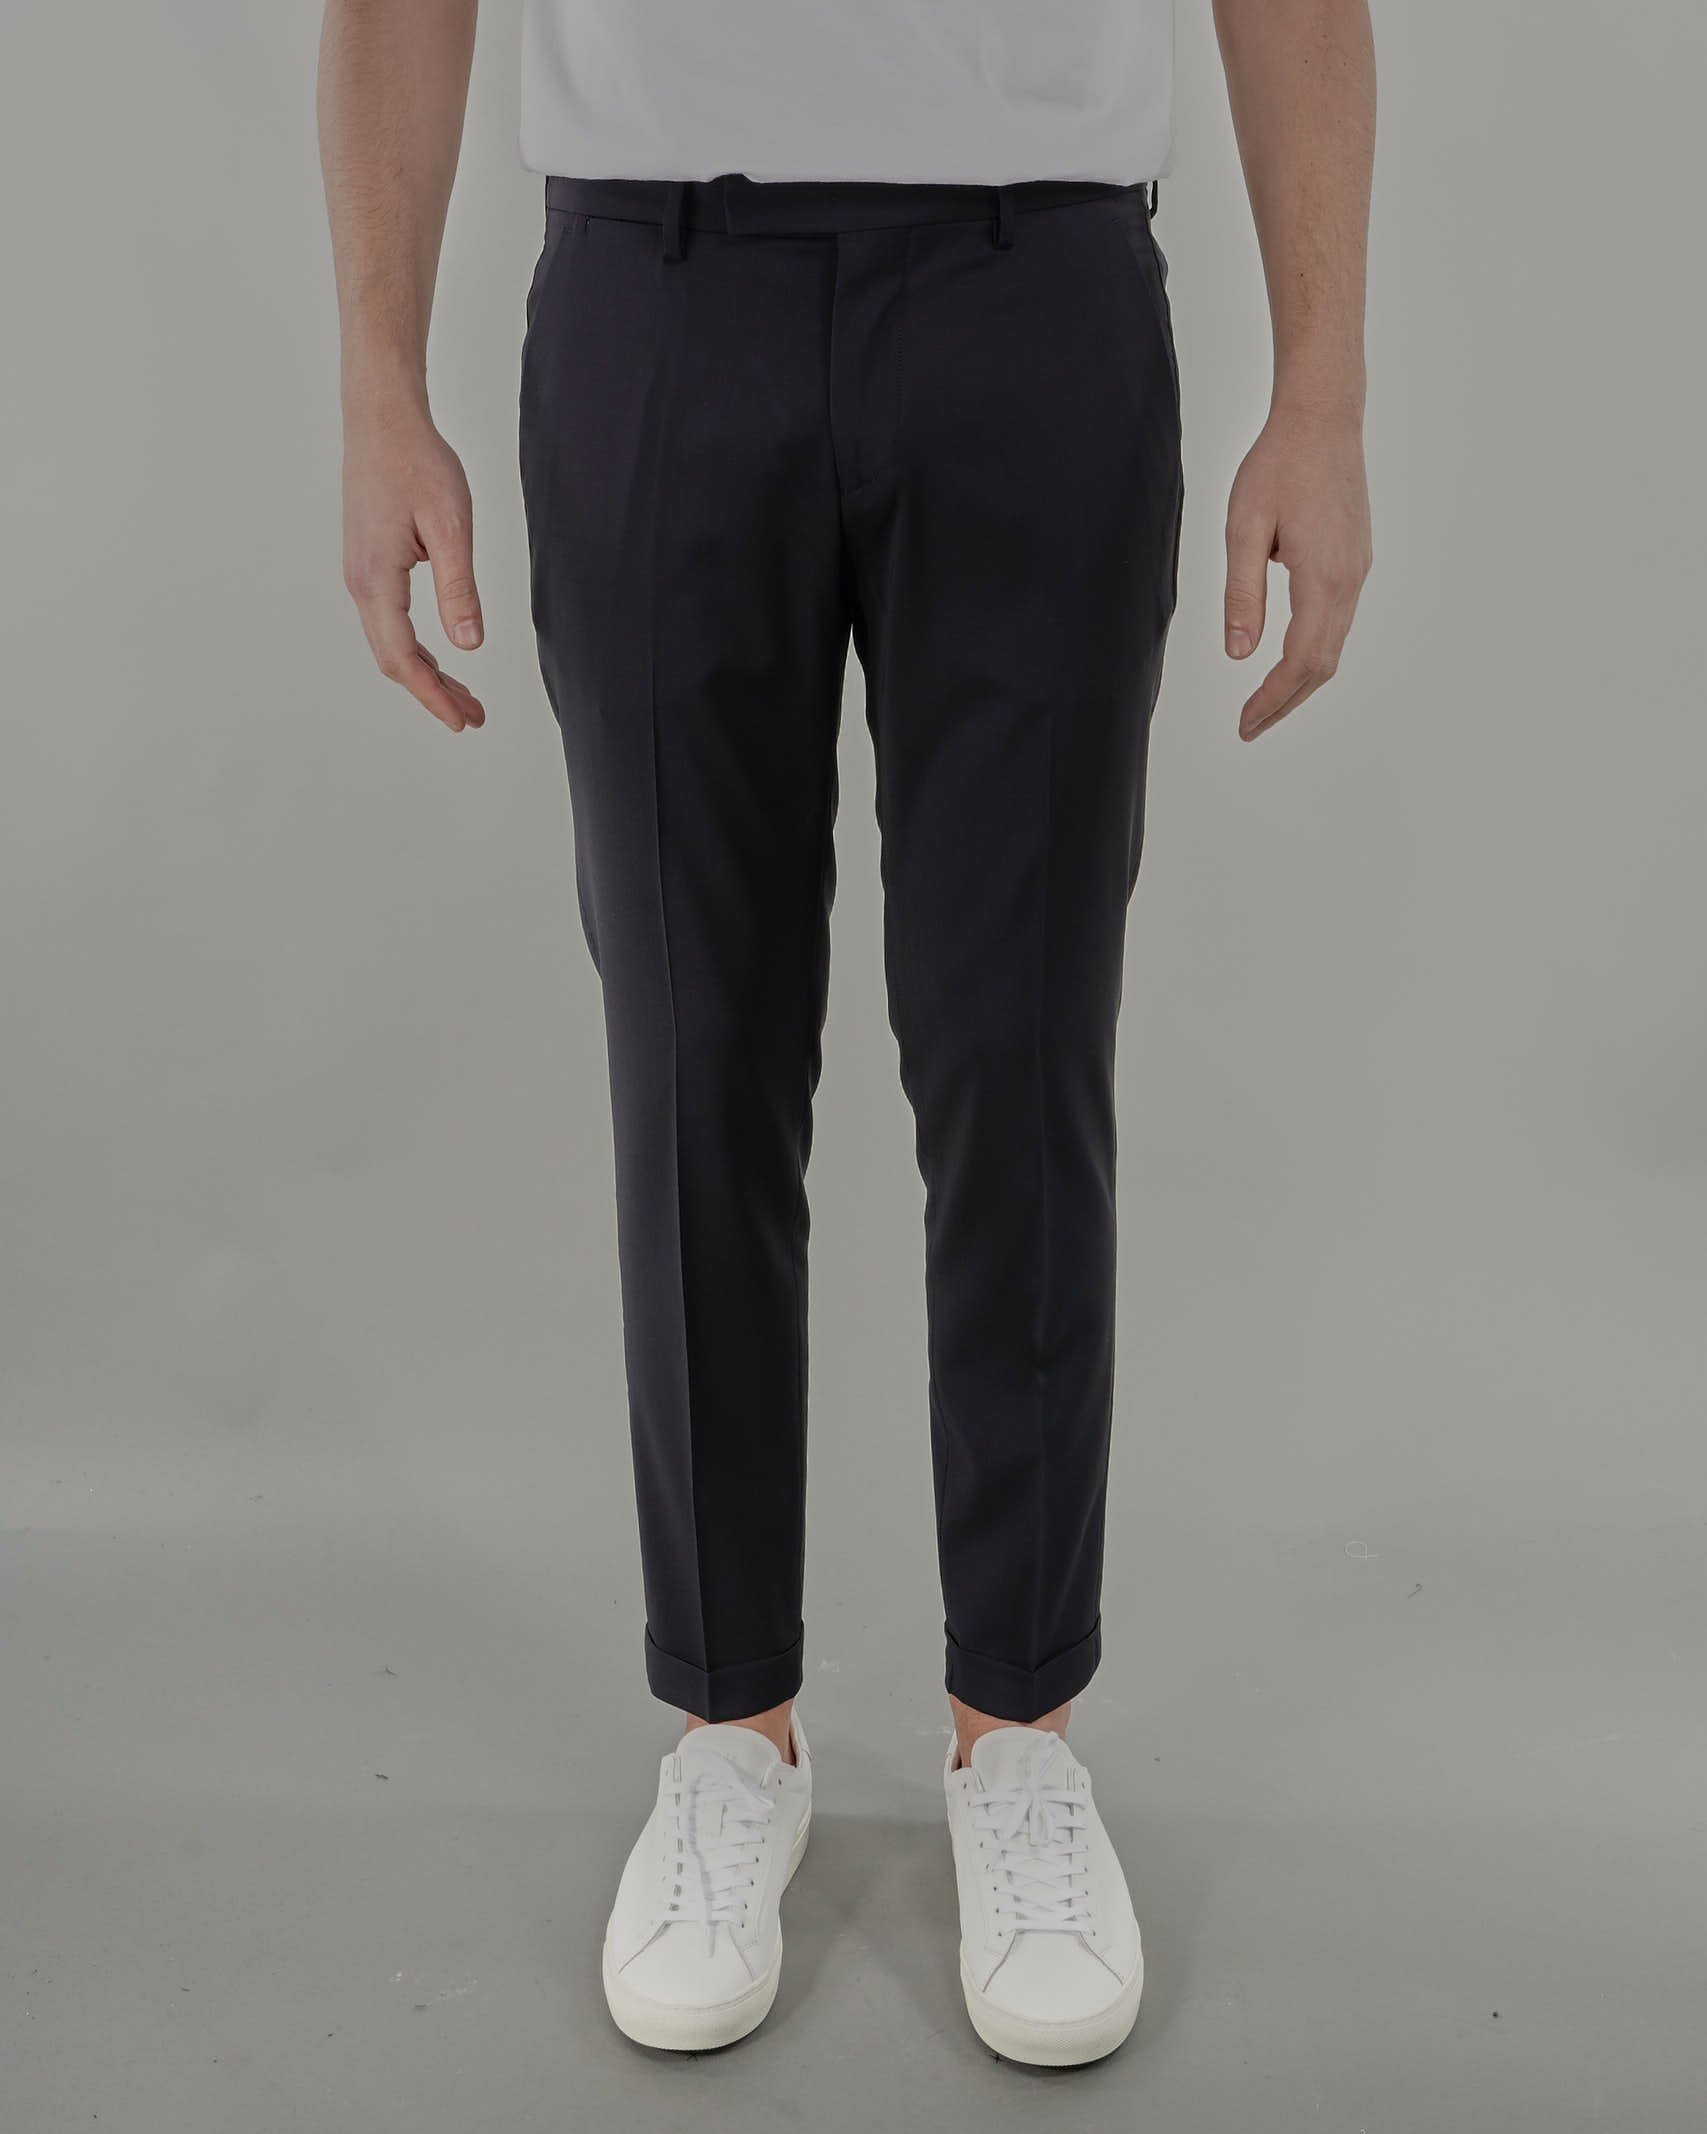 Pantalone in fresco lana Michael Coal MICHAEL COAL   Pantalone   BRAAM03667S21CBLU